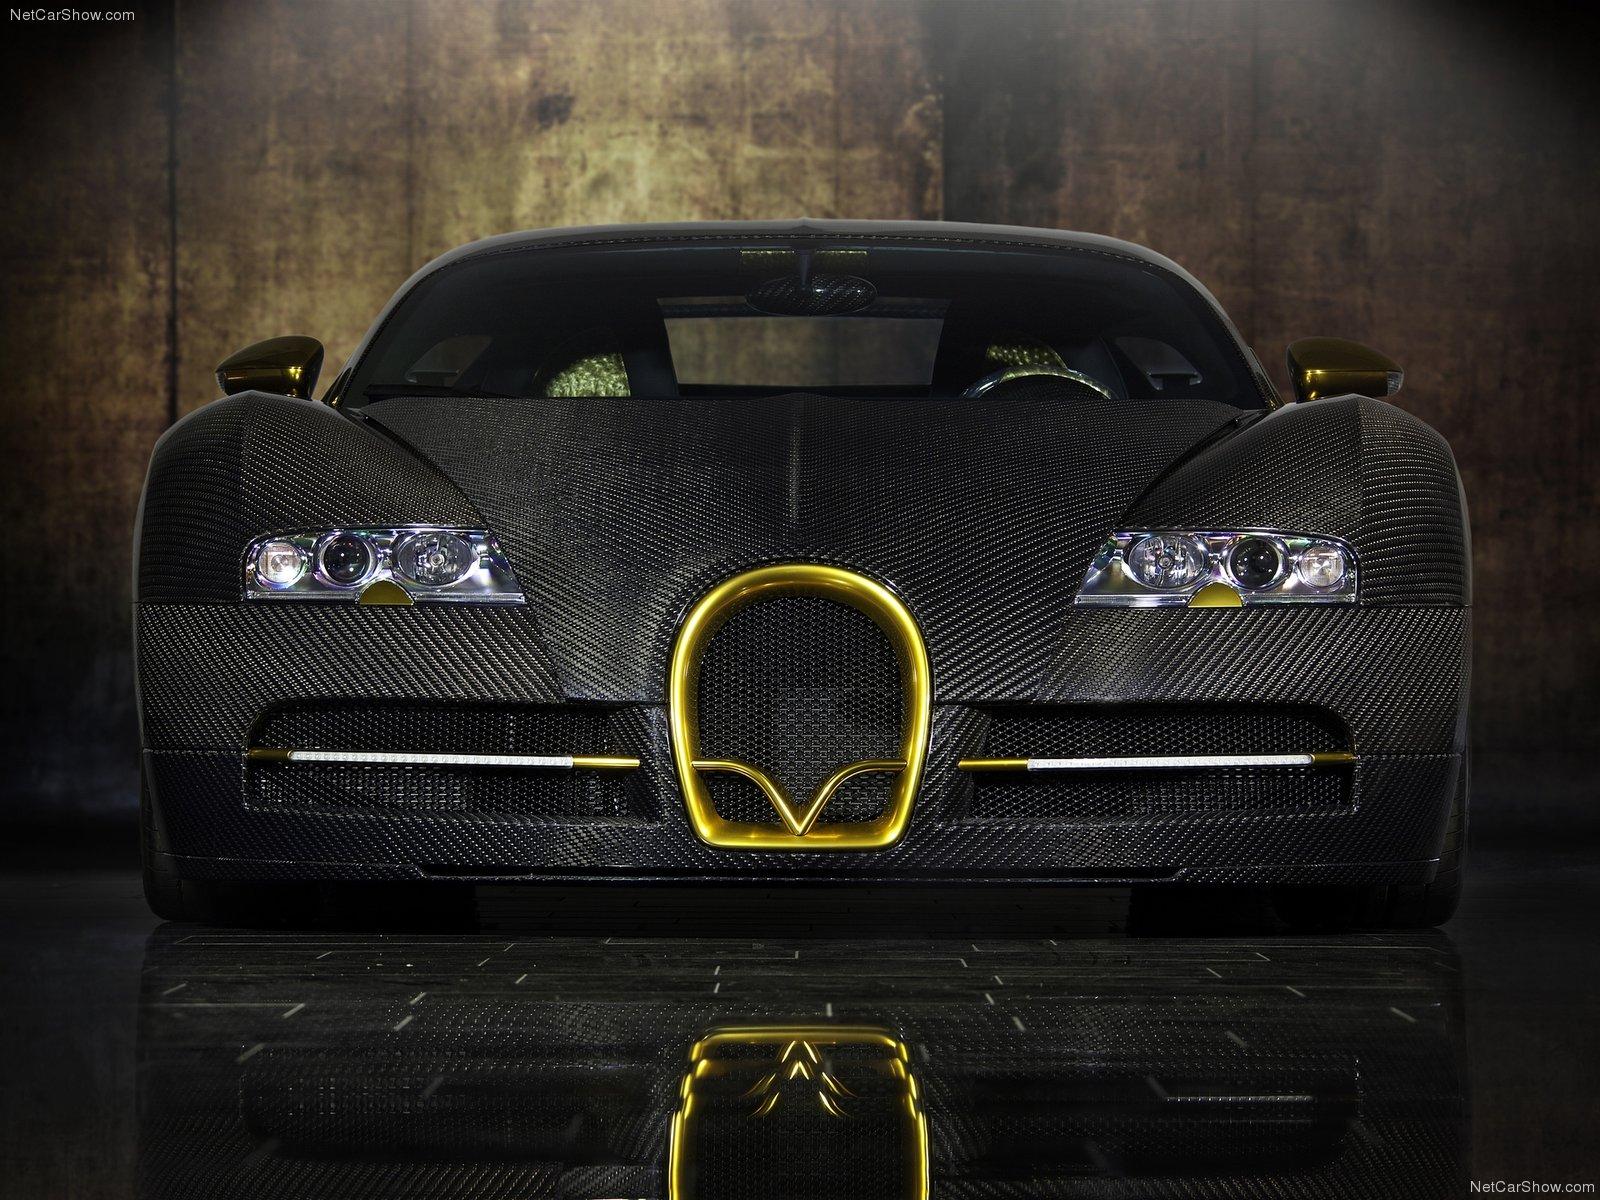 http://3.bp.blogspot.com/-gX-a-2AR8TY/UAh9qBJkM0I/AAAAAAAABtA/kki74DarrPk/s1600/Mansory-Bugatti-Veyron-Linea-Vincero-d%E2%80%99Oro-Picture-2.jpg